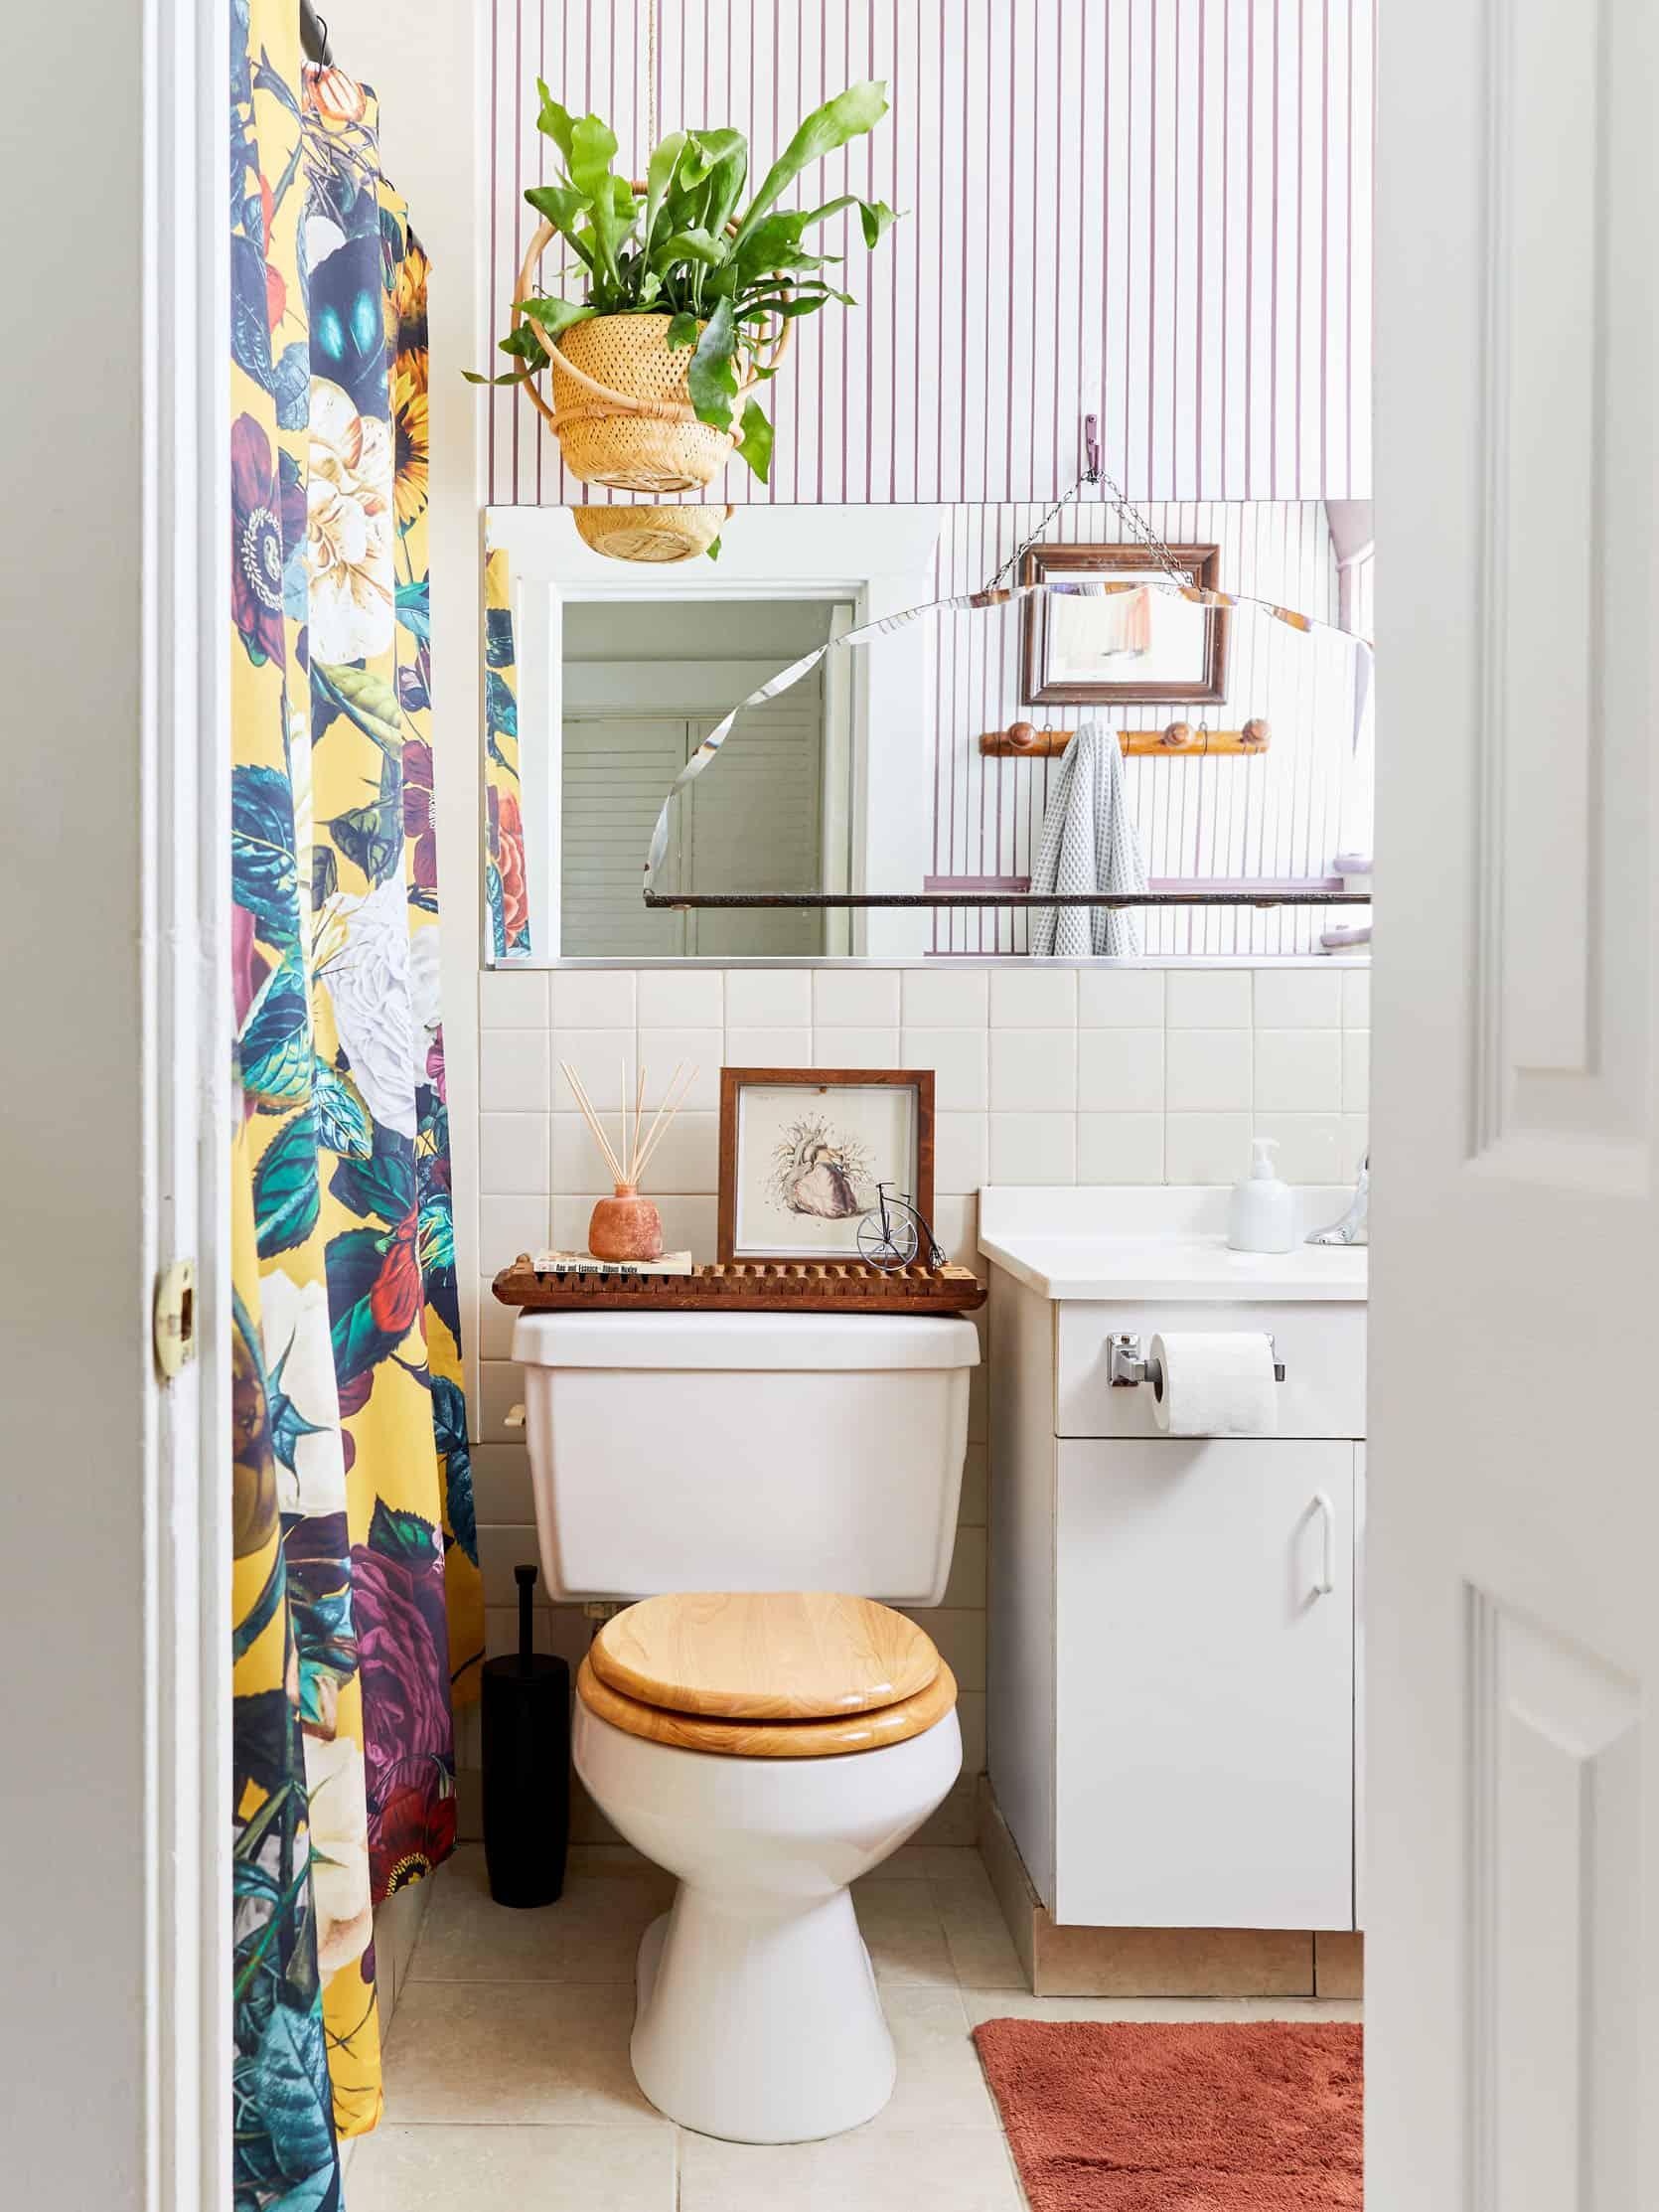 Moto Reveal Julie S Anything But Beige Amazing Diy Bathroom Refresh Emily Henderson